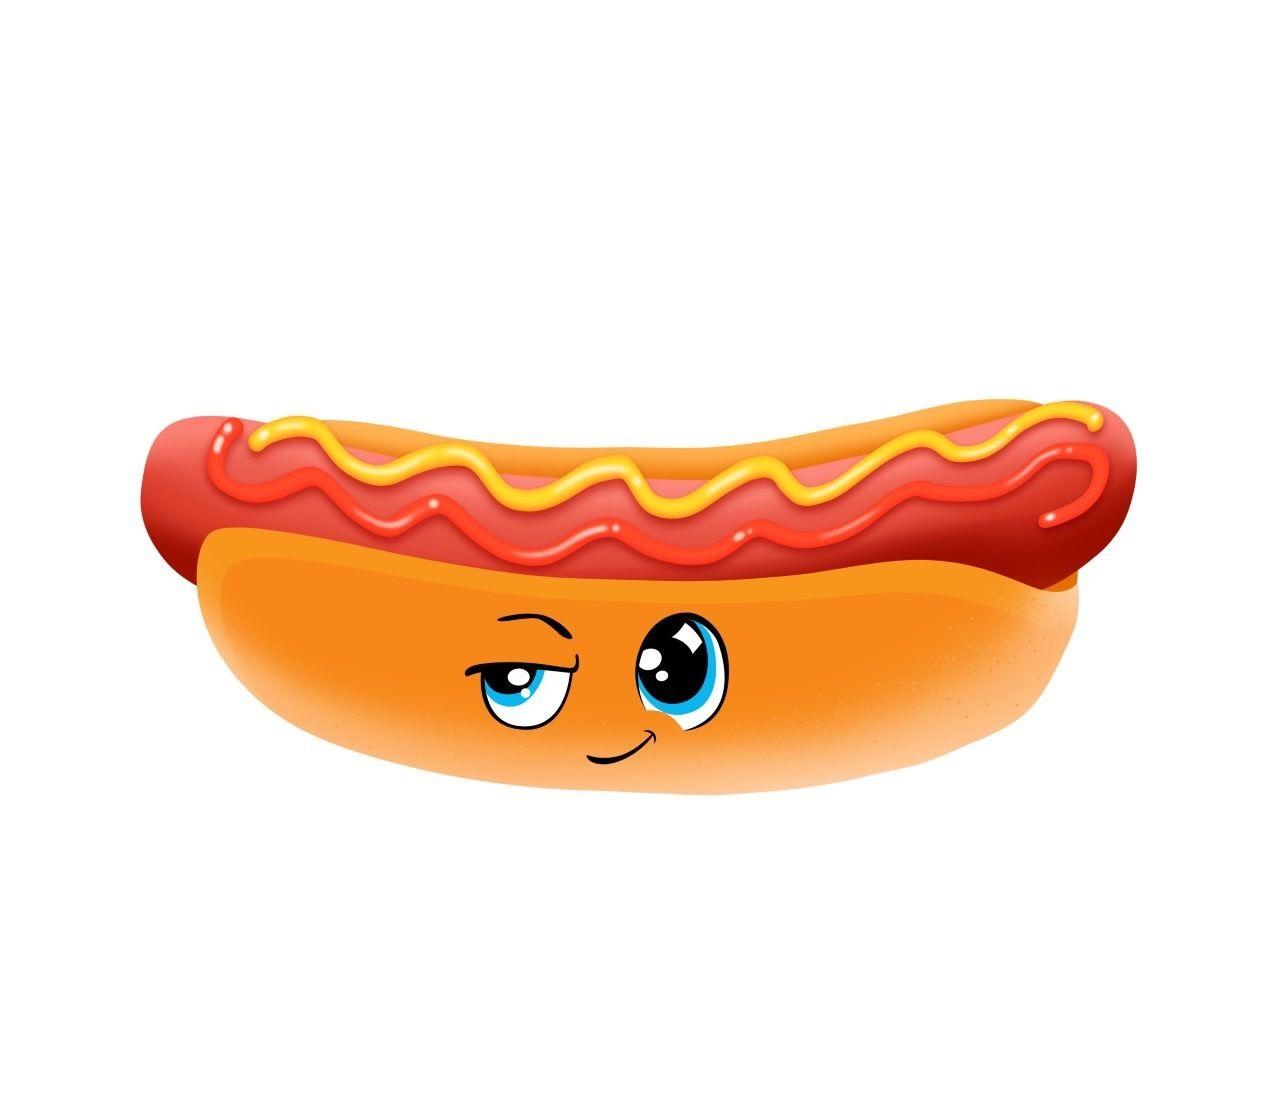 Sillysquishies Com Hot Dog 19 99 Https Www Sillysquishies